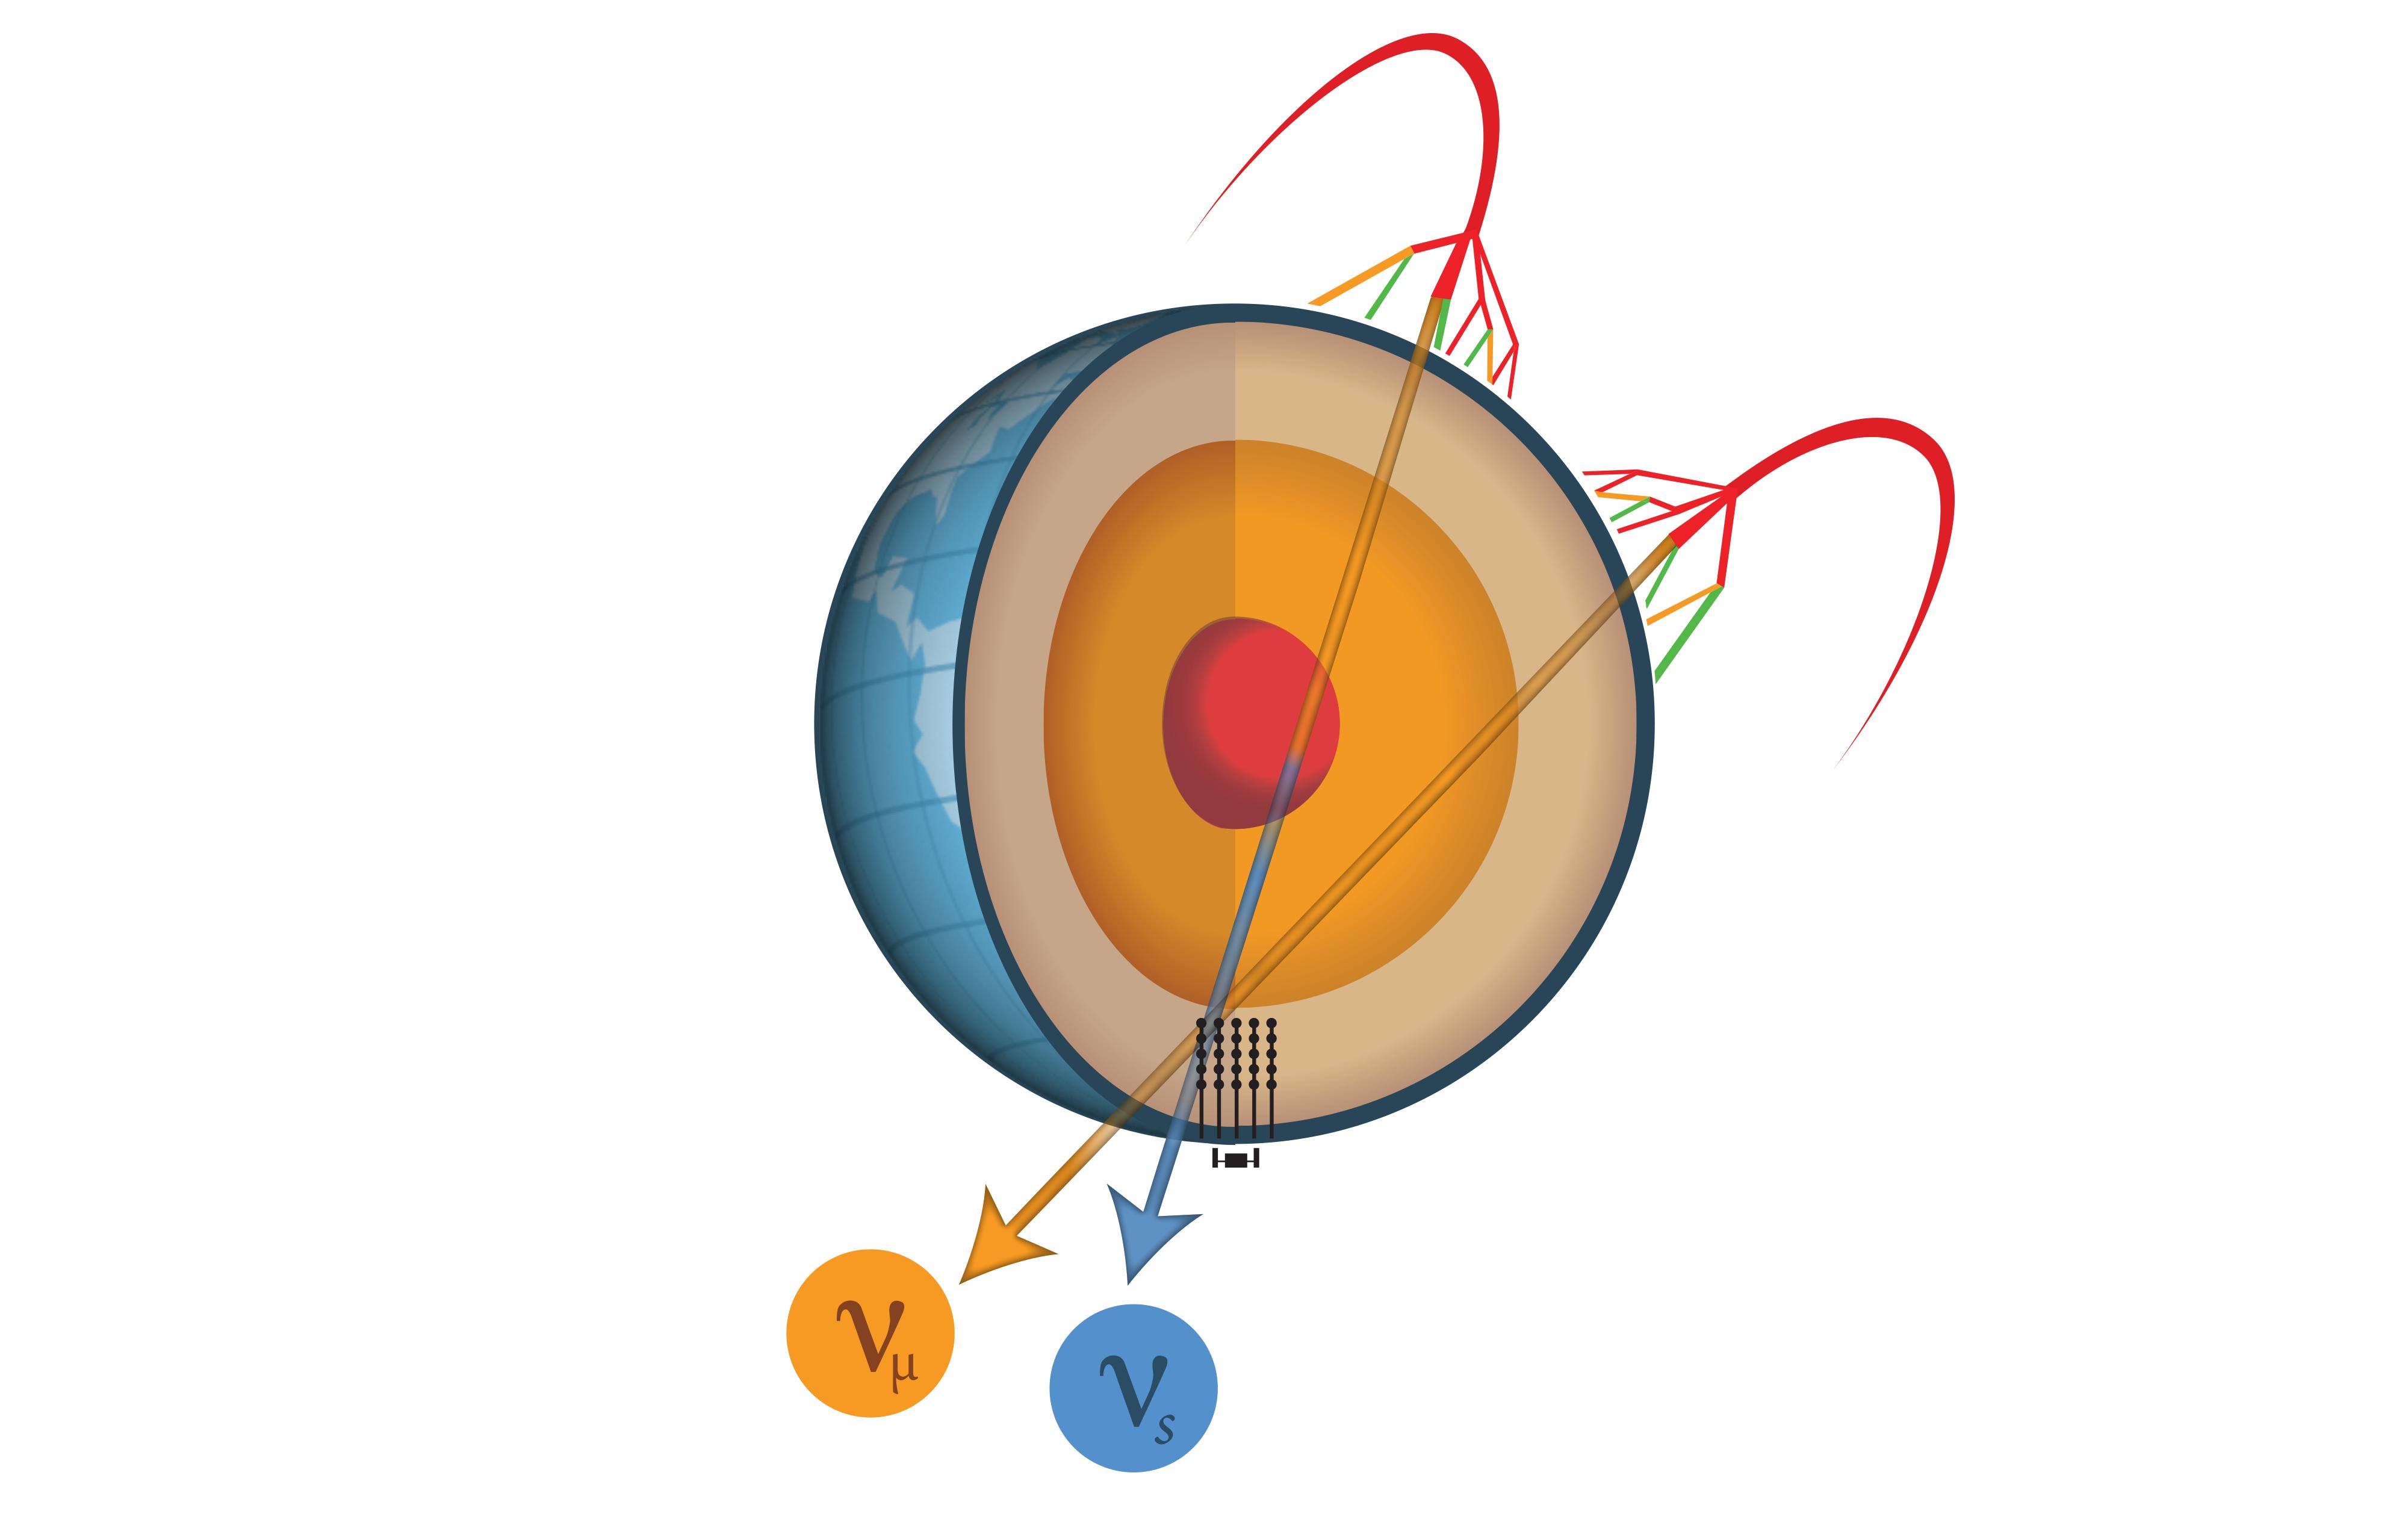 news_feat_icecube-search-for-terile-neutrino-draws-blank